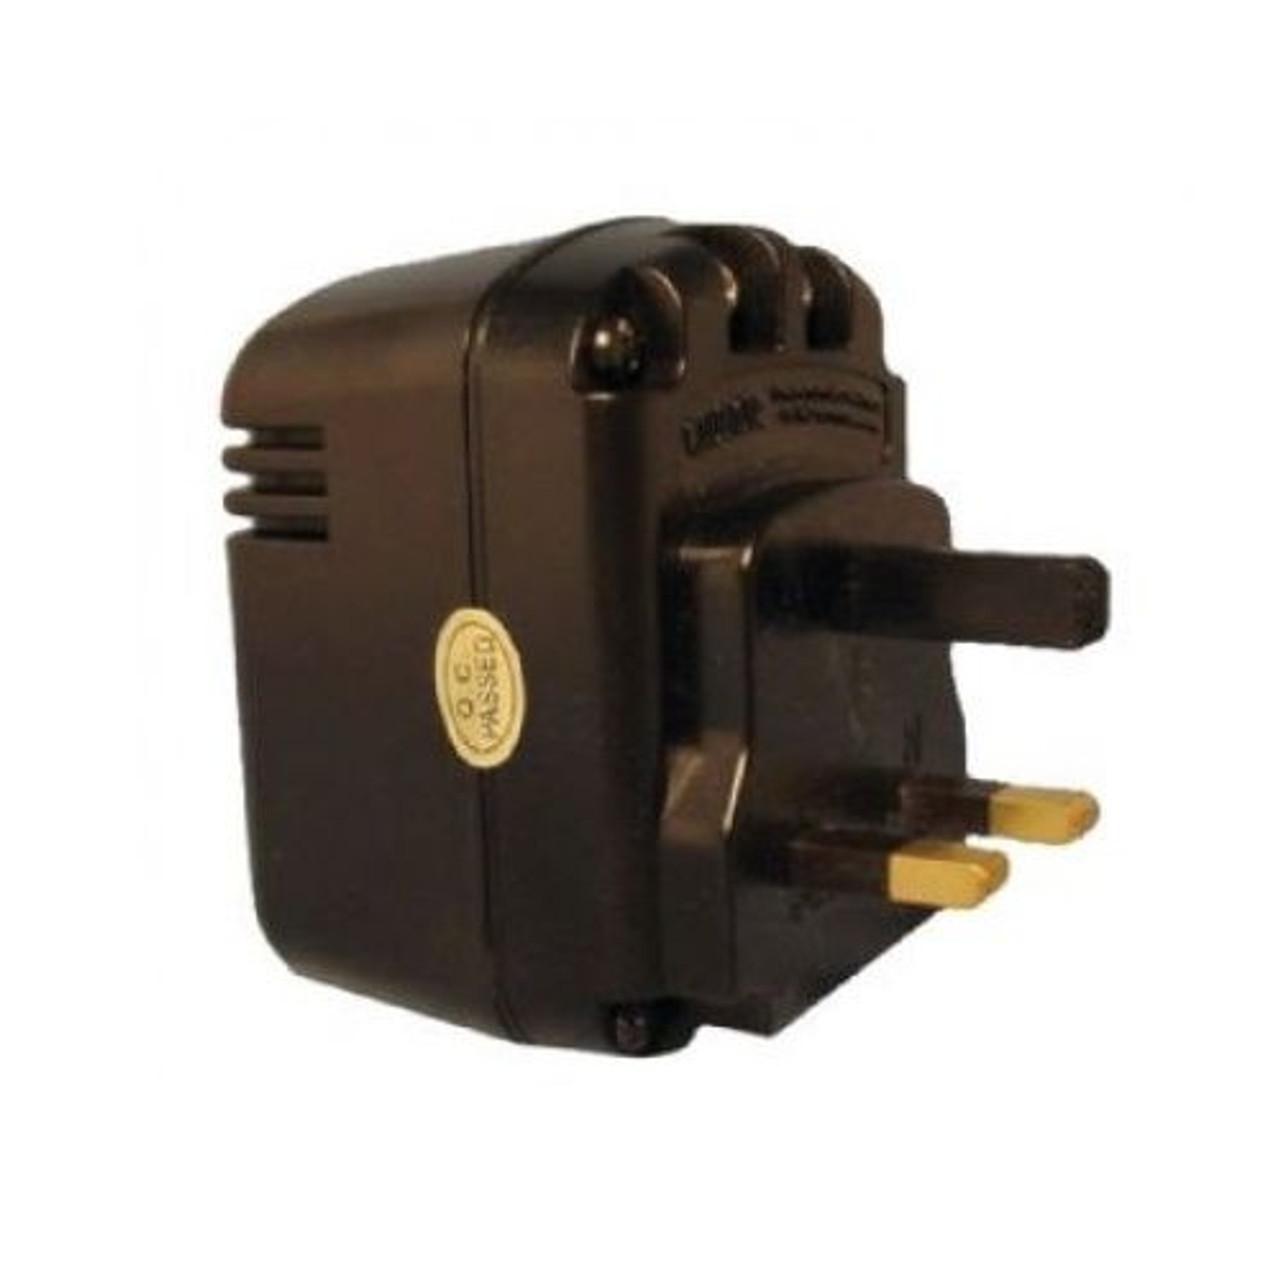 Transformer + Connection Cable DE005 + 7235